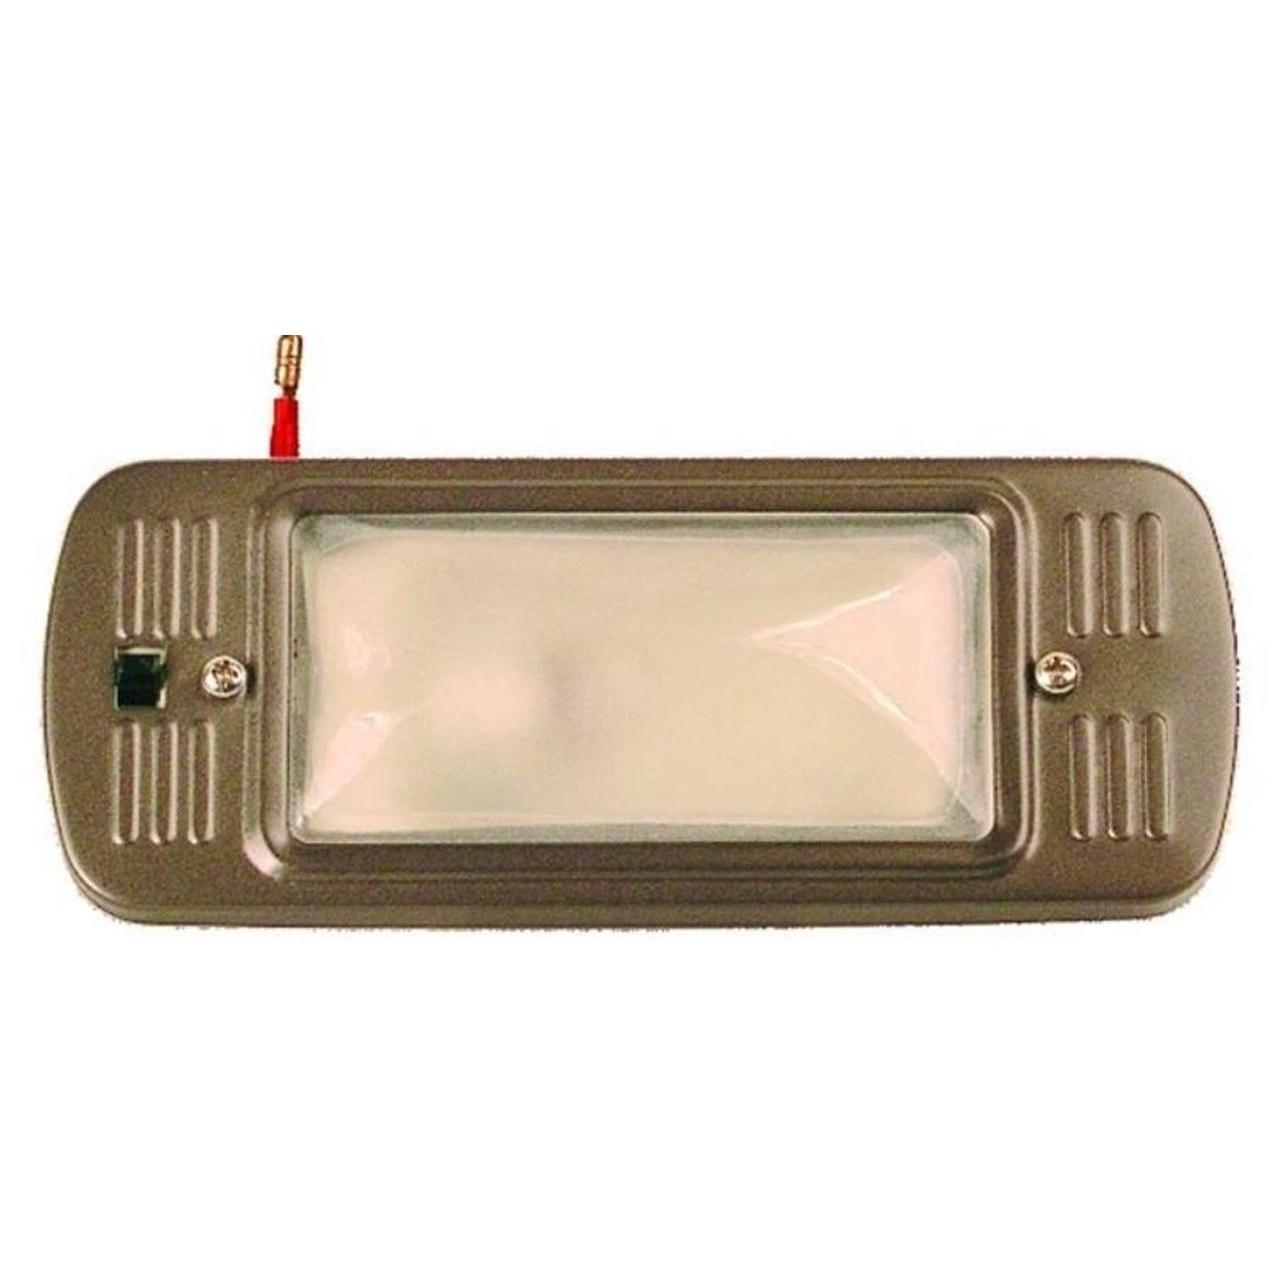 Dome Lamp or Light Assemblies